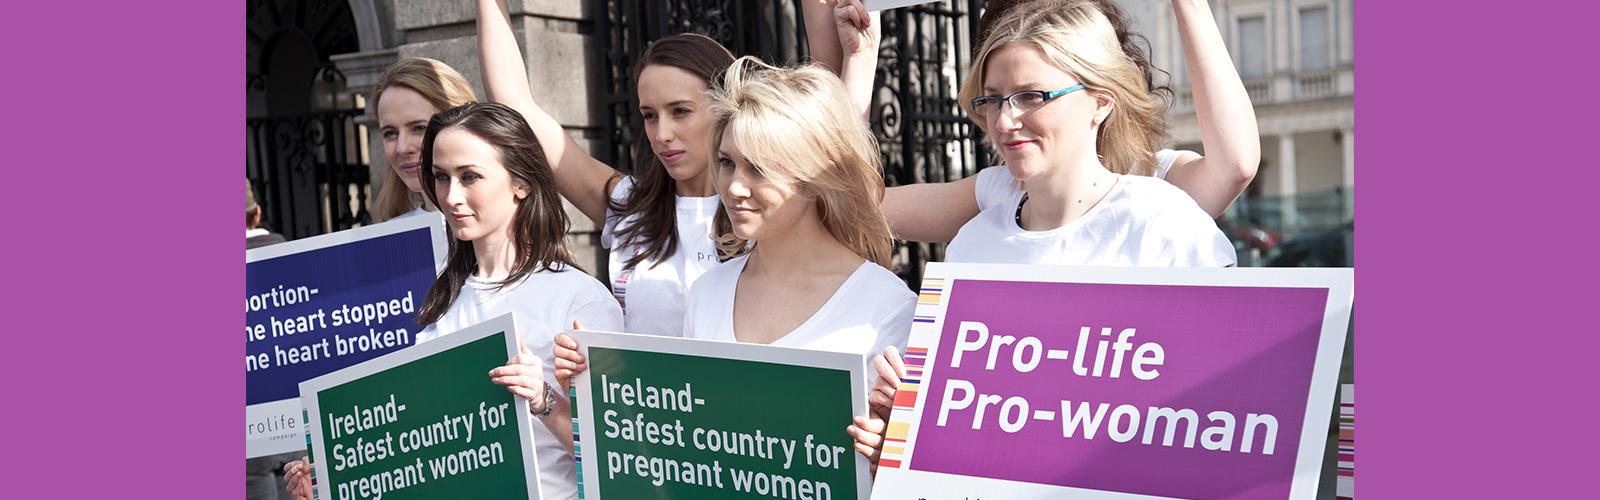 Prolife-20-ireland